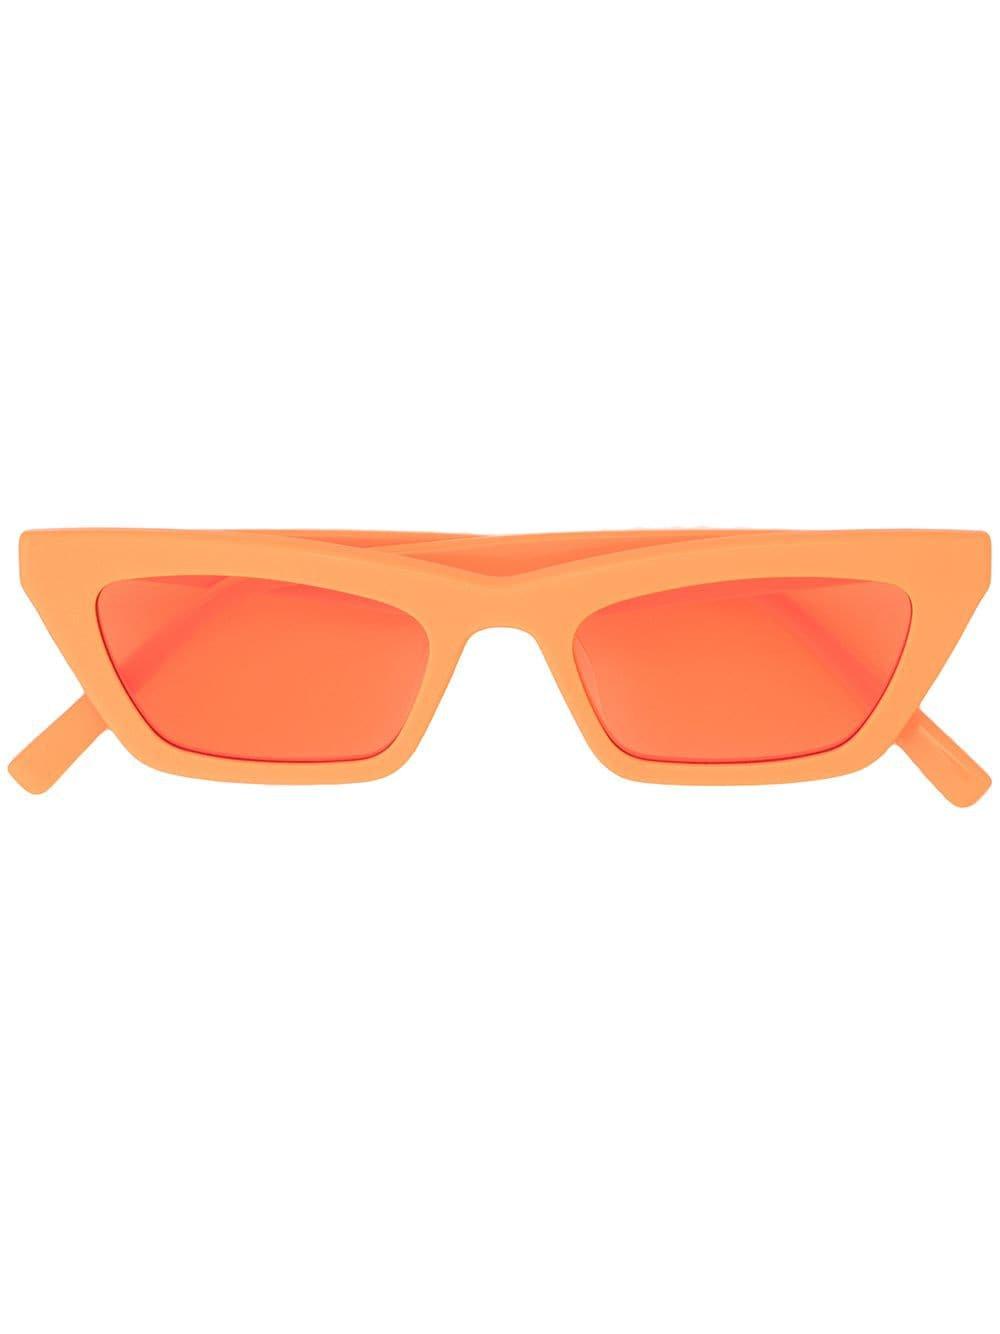 Gentle Monster Chap Sunglasses